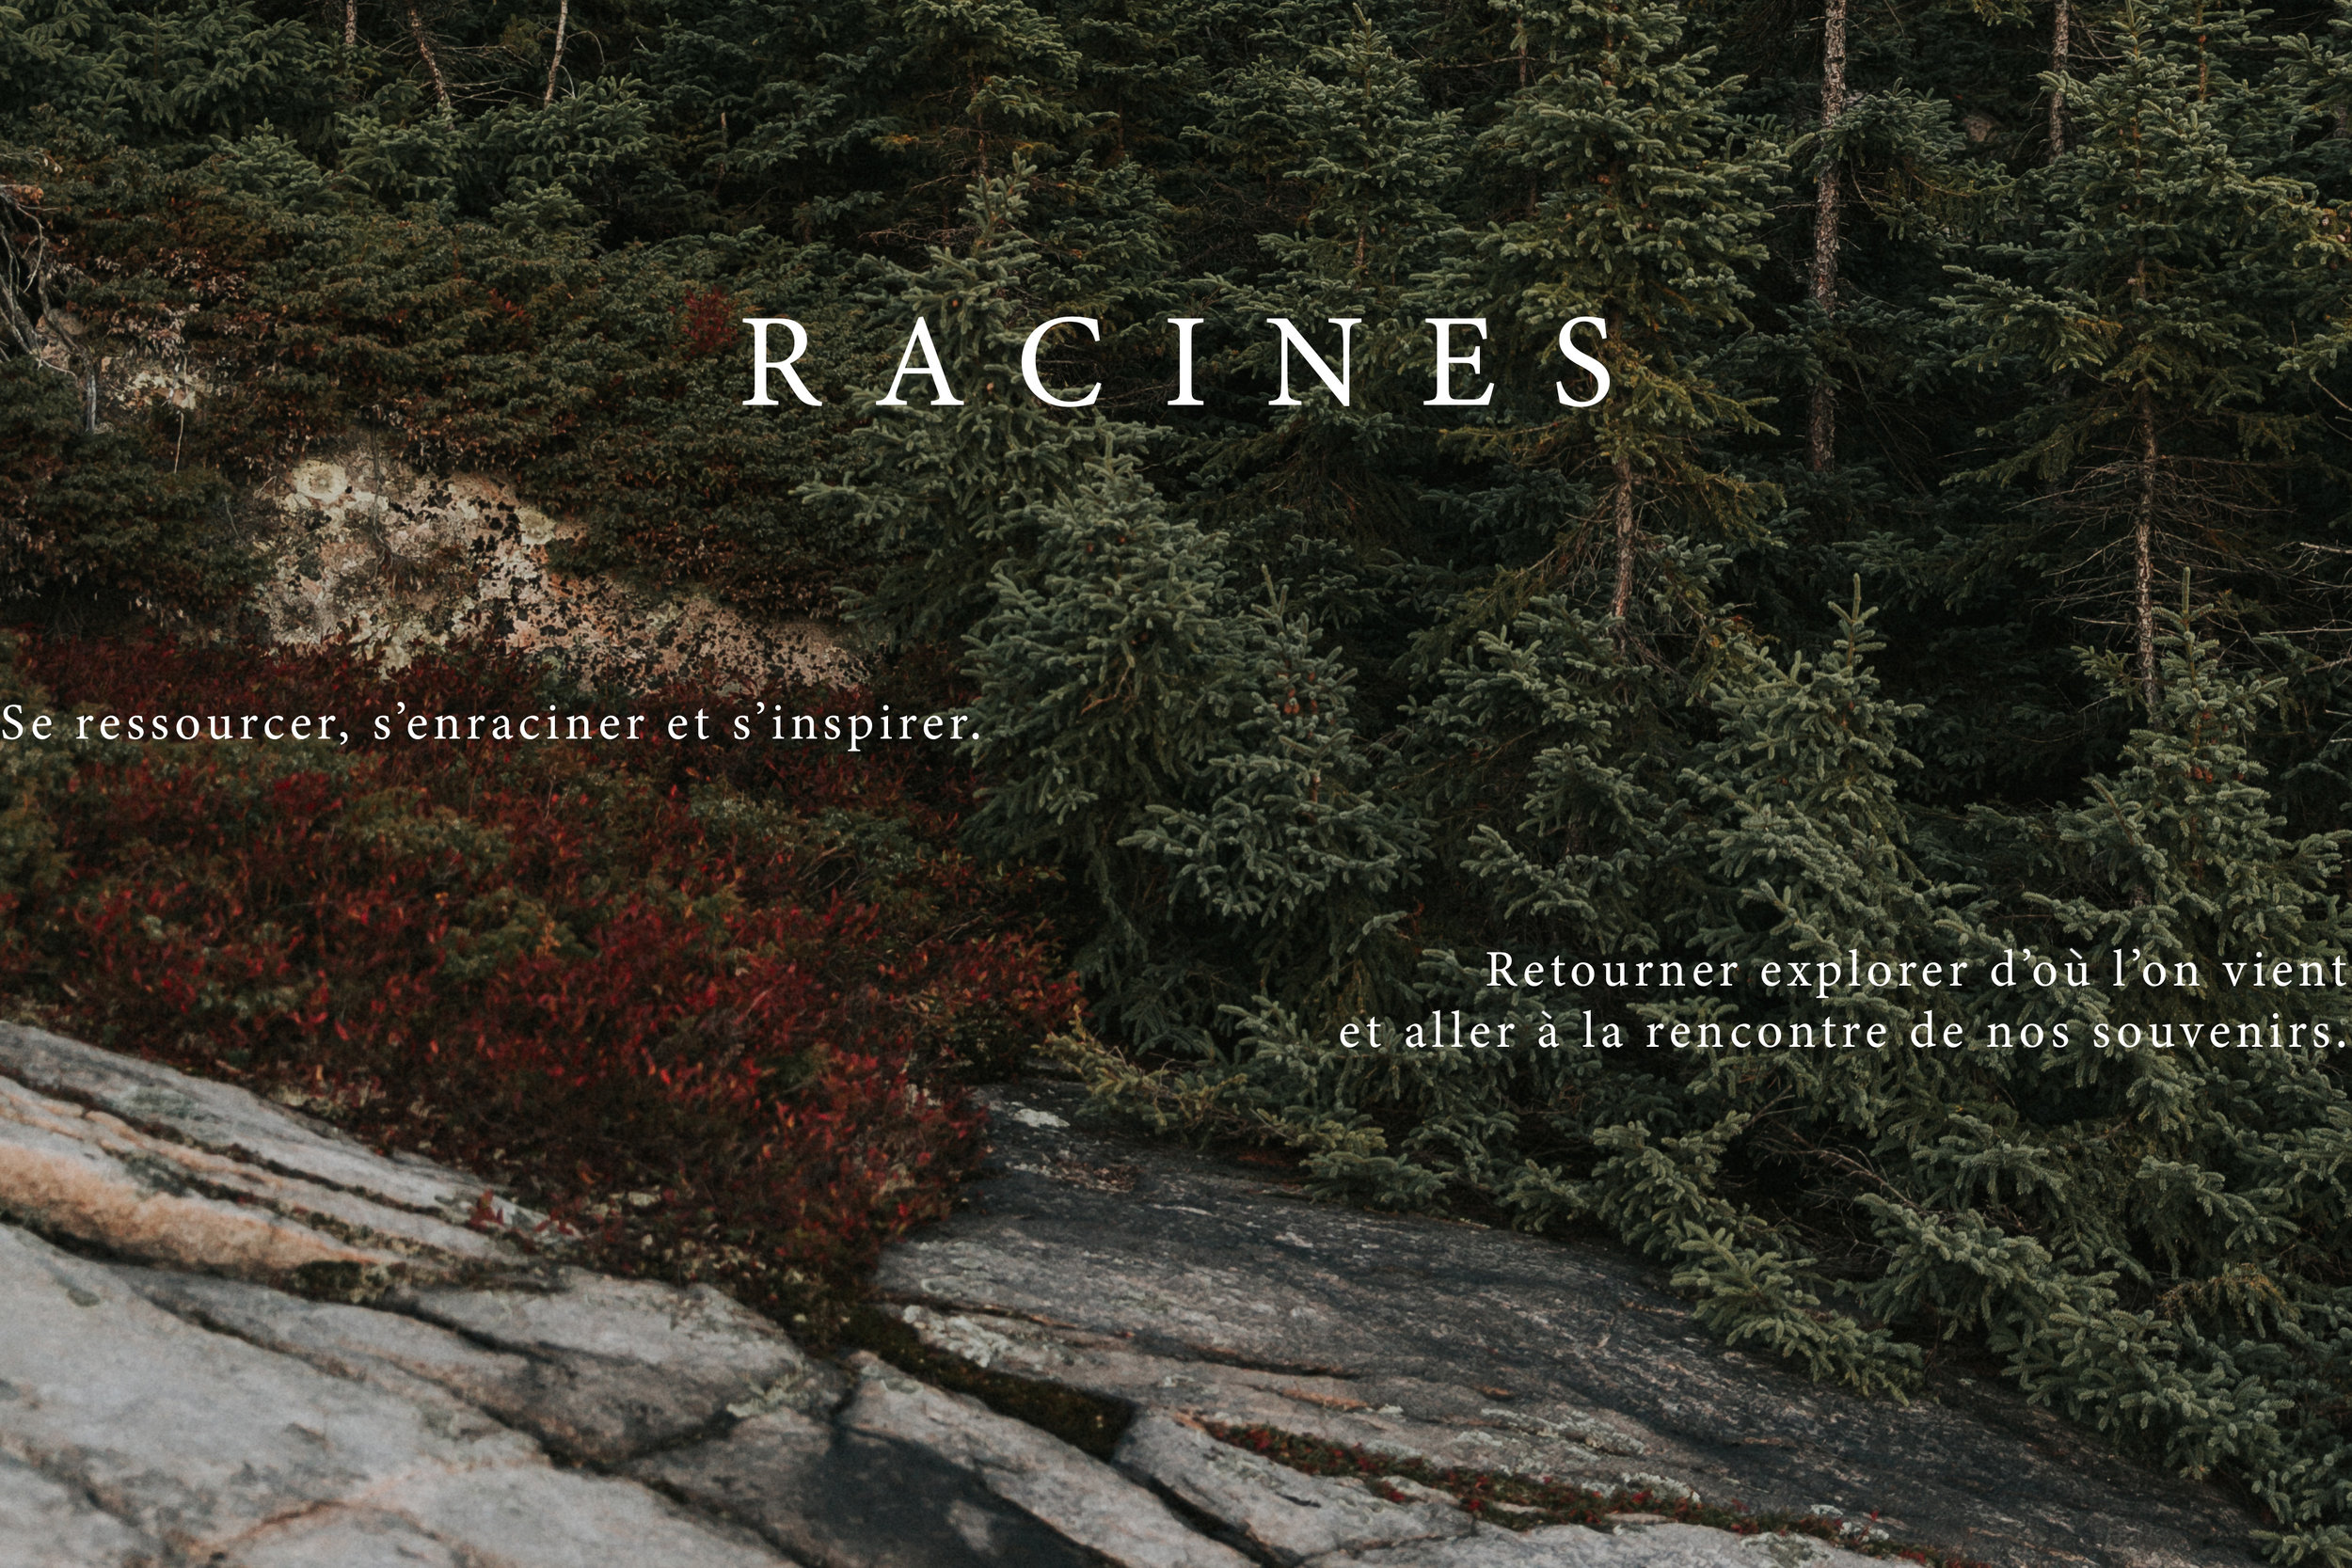 racines-1.jpg